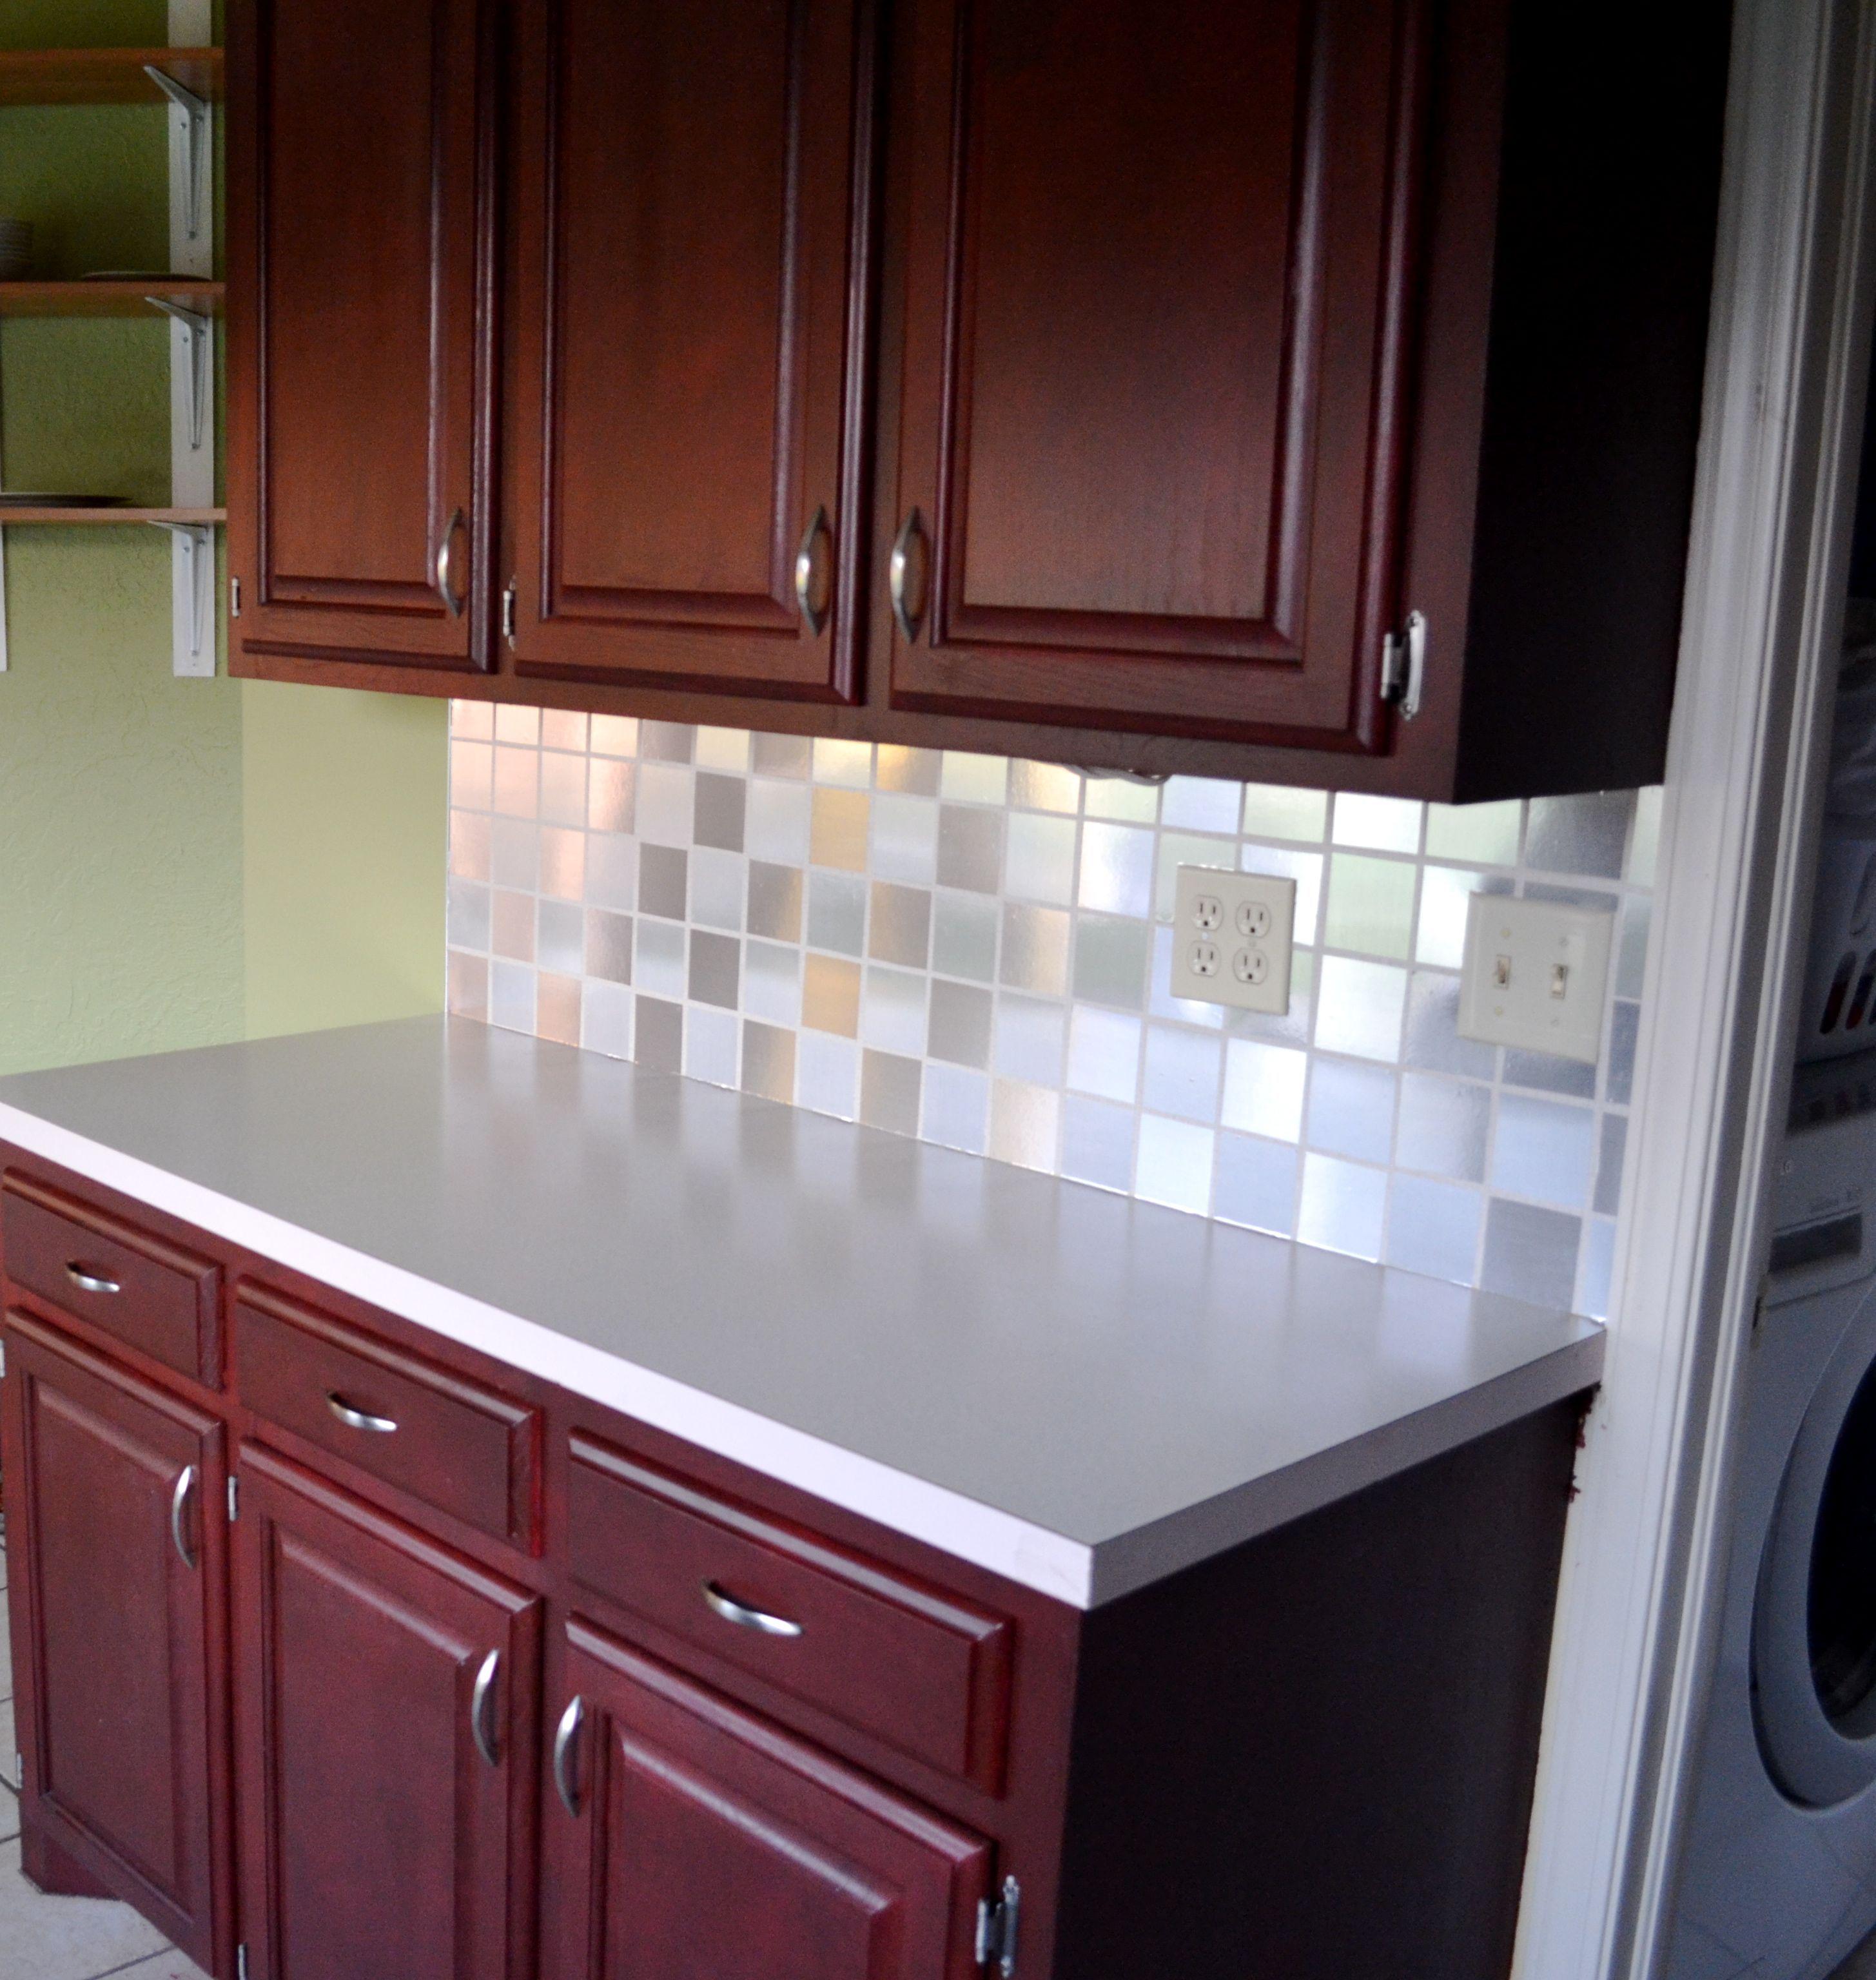 Contact Paper Tiled Backsplash Renters Decorating Home Kitchens Home Decor